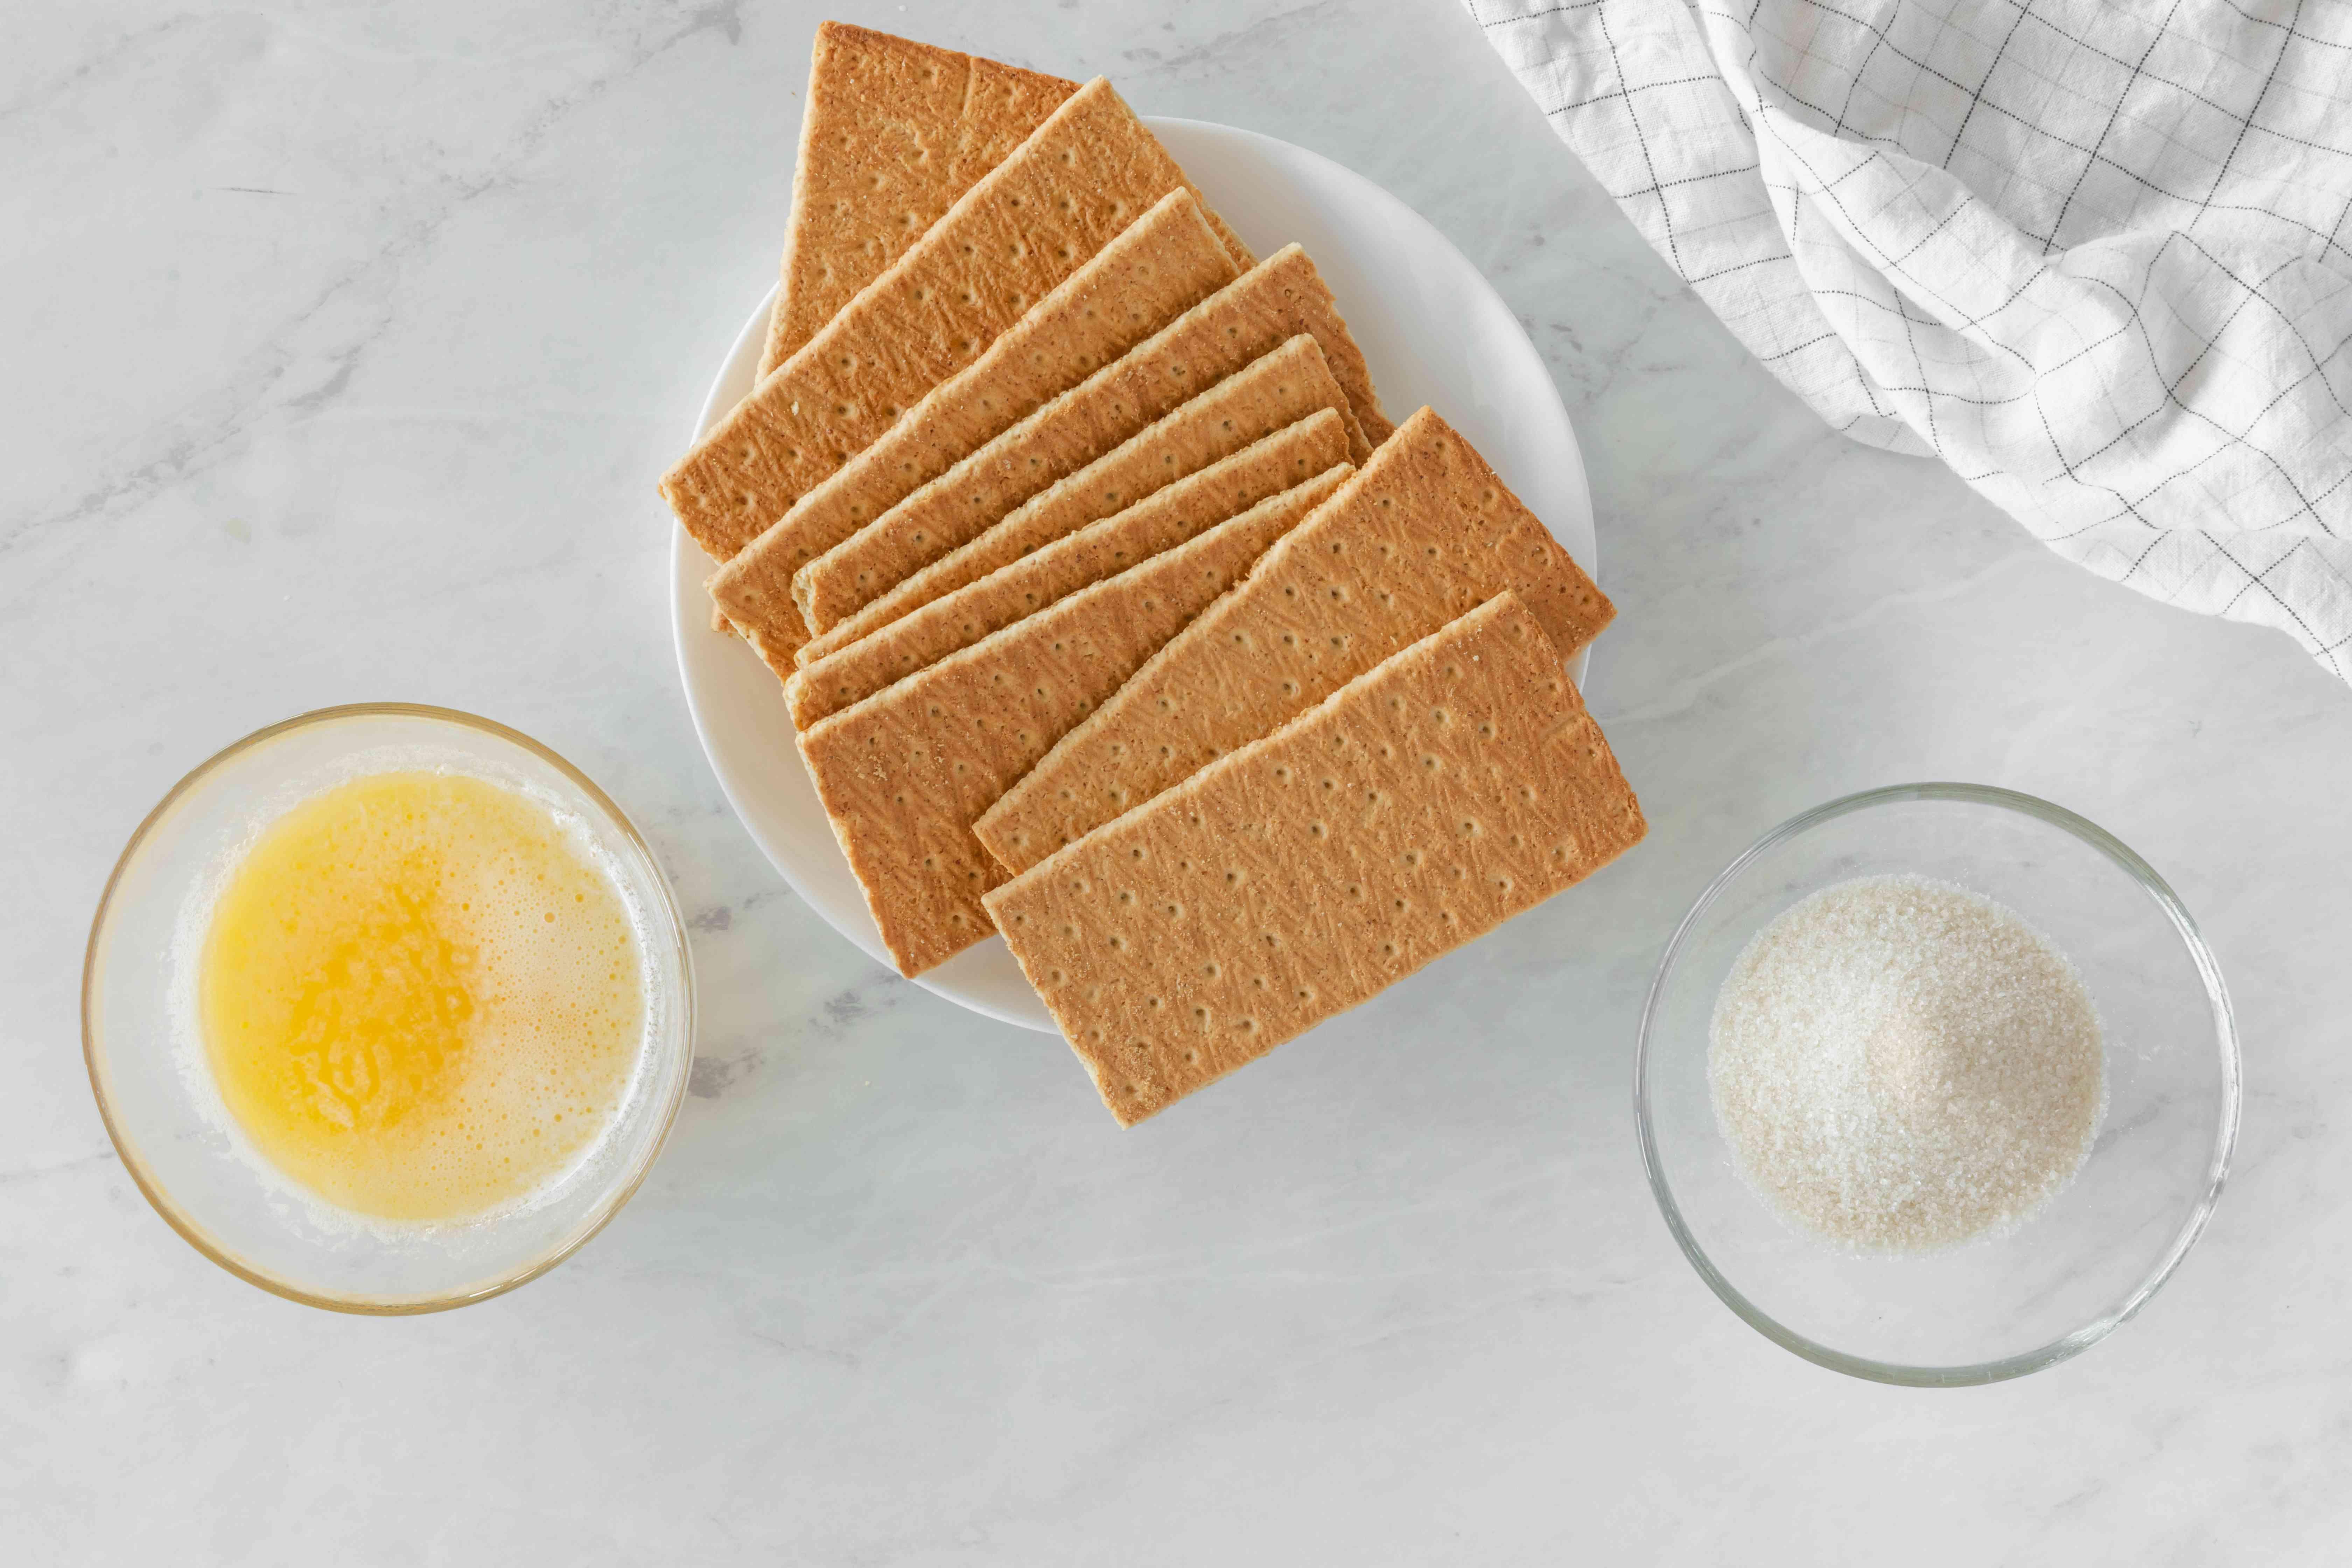 Ingredients for graham cracker crust